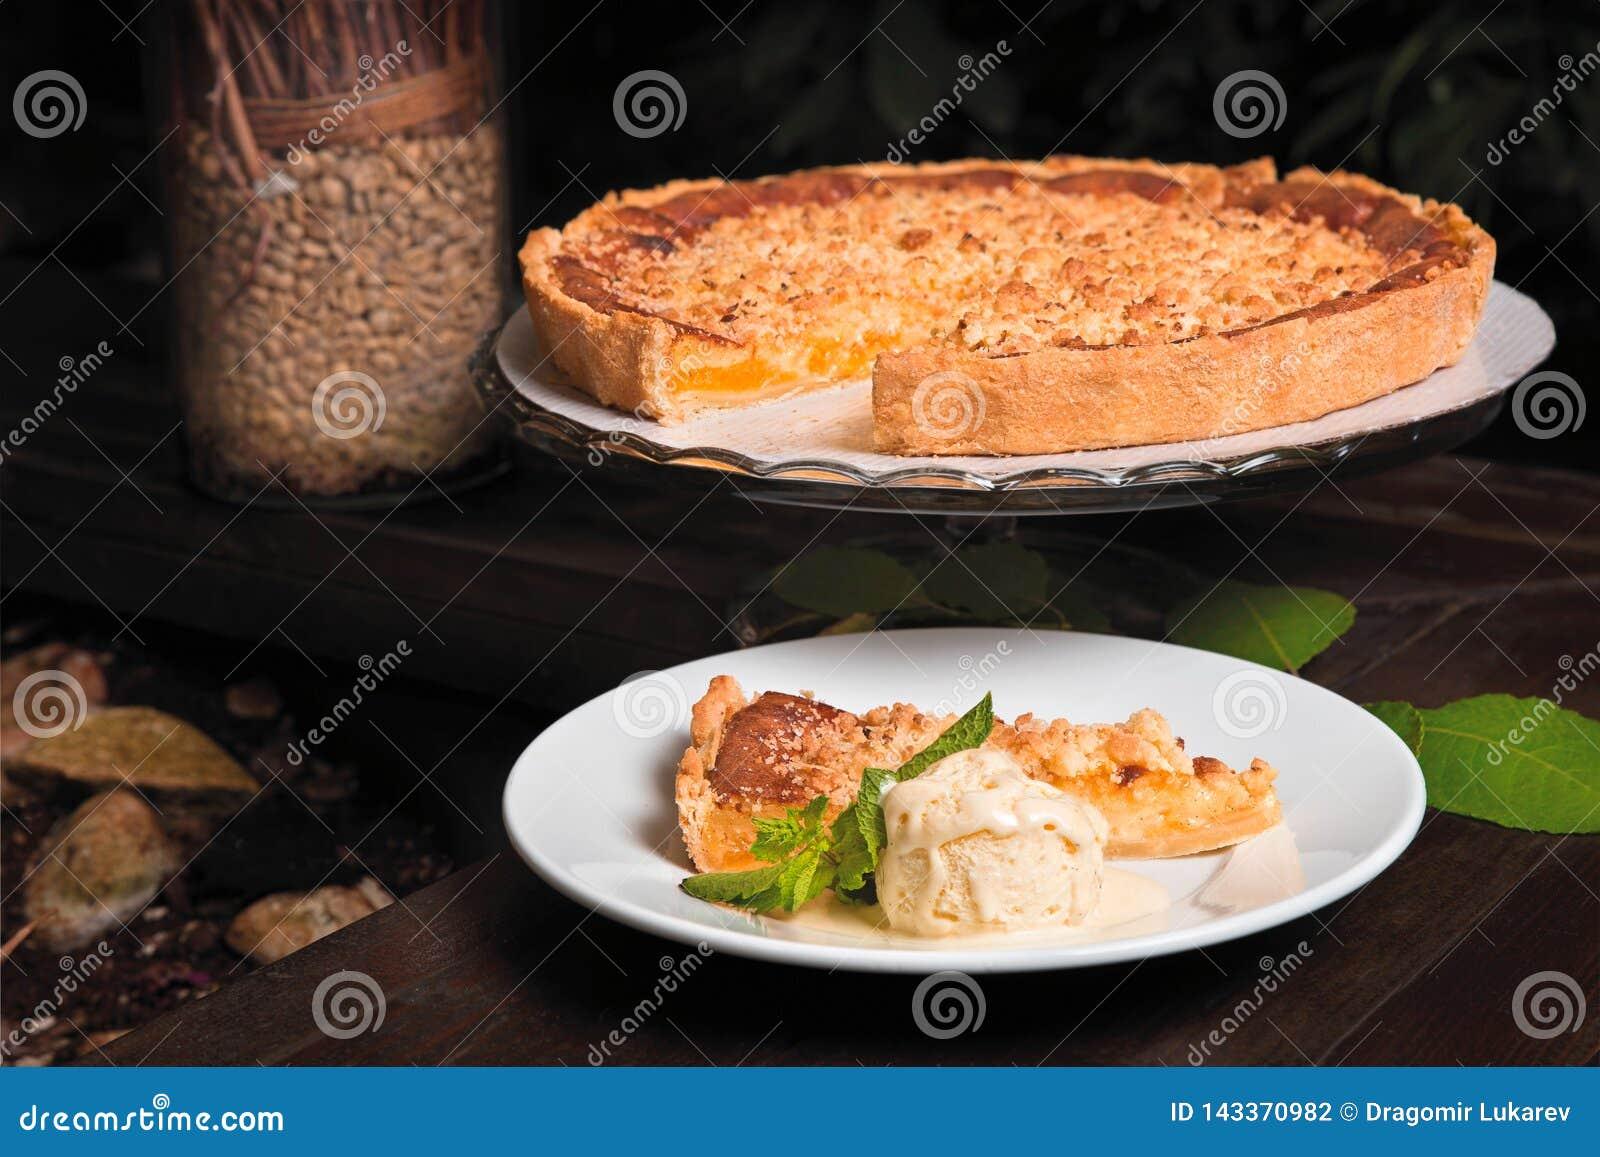 Lemon tart with mint and ice cream.